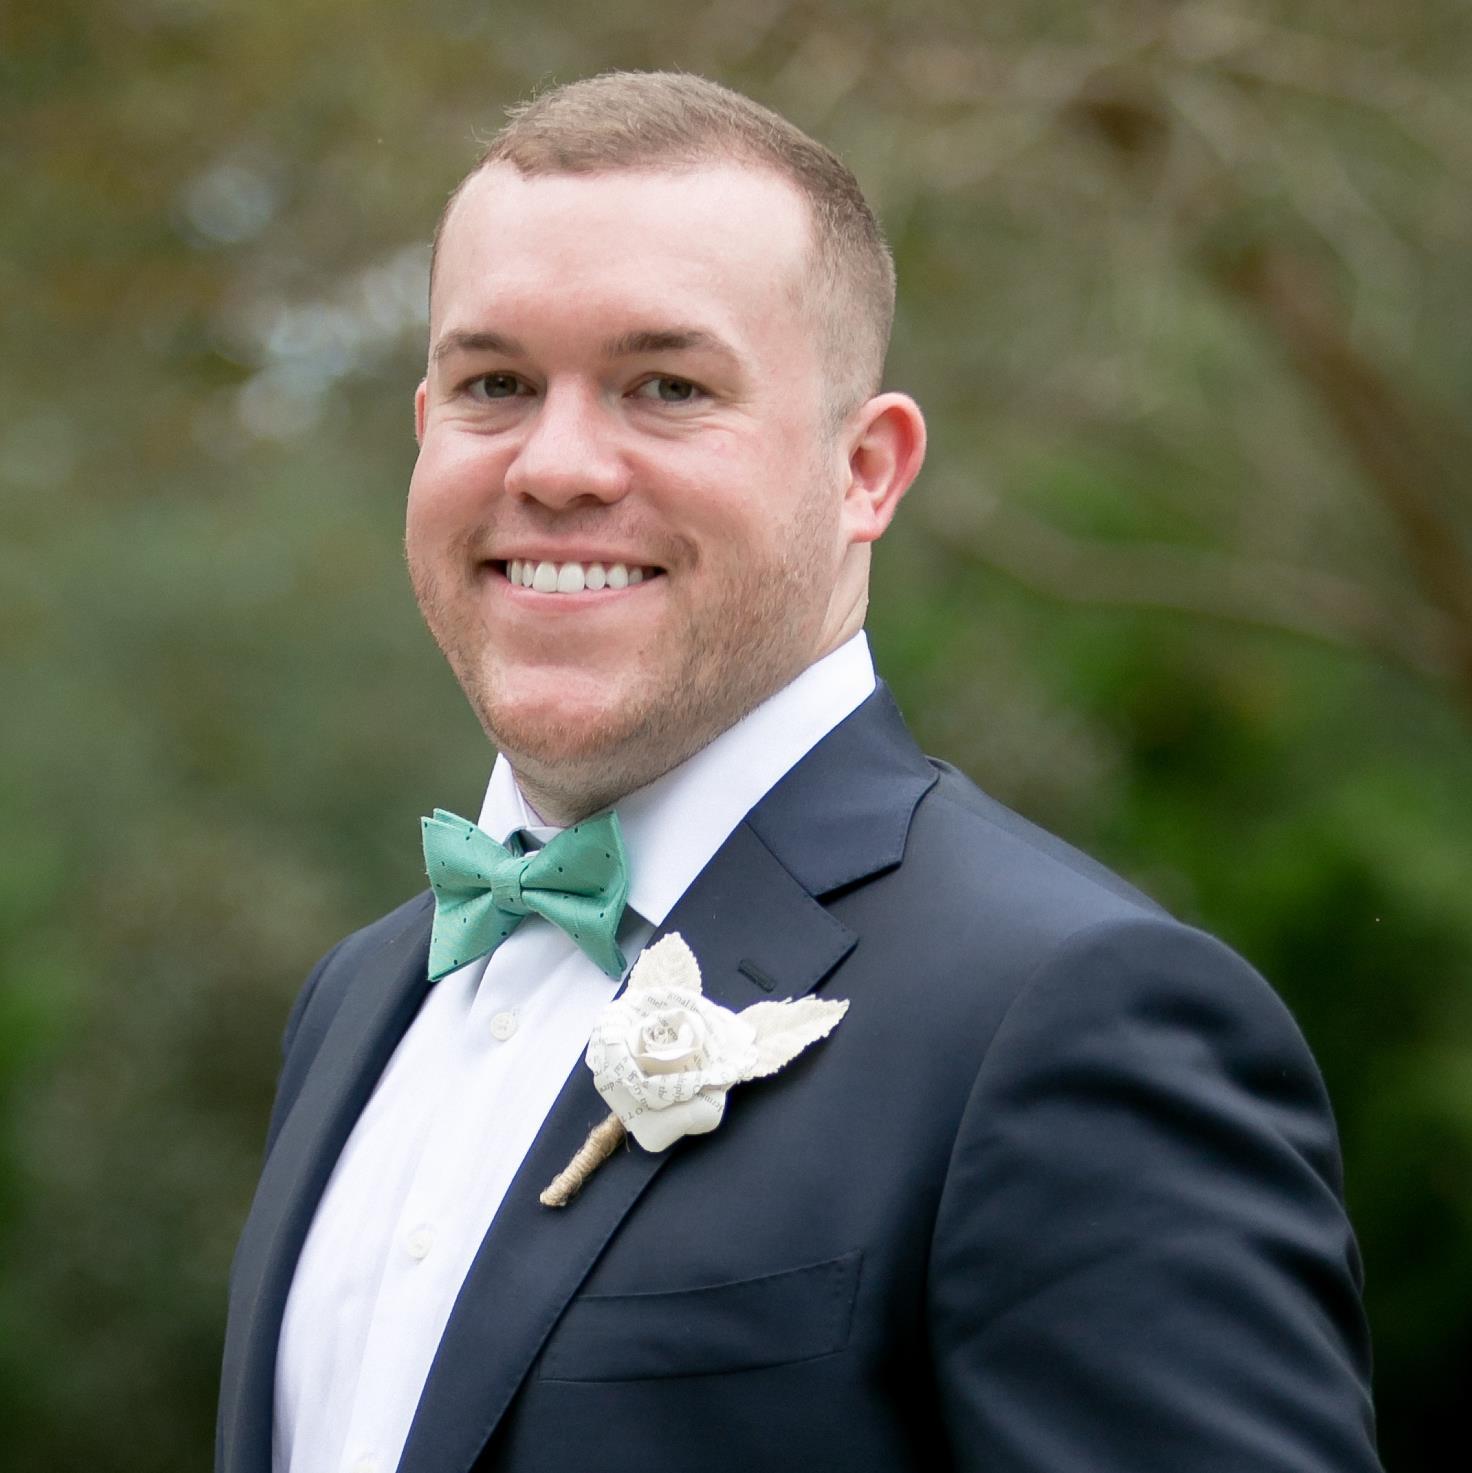 wedding pic edited - Nick Holmes.jpeg